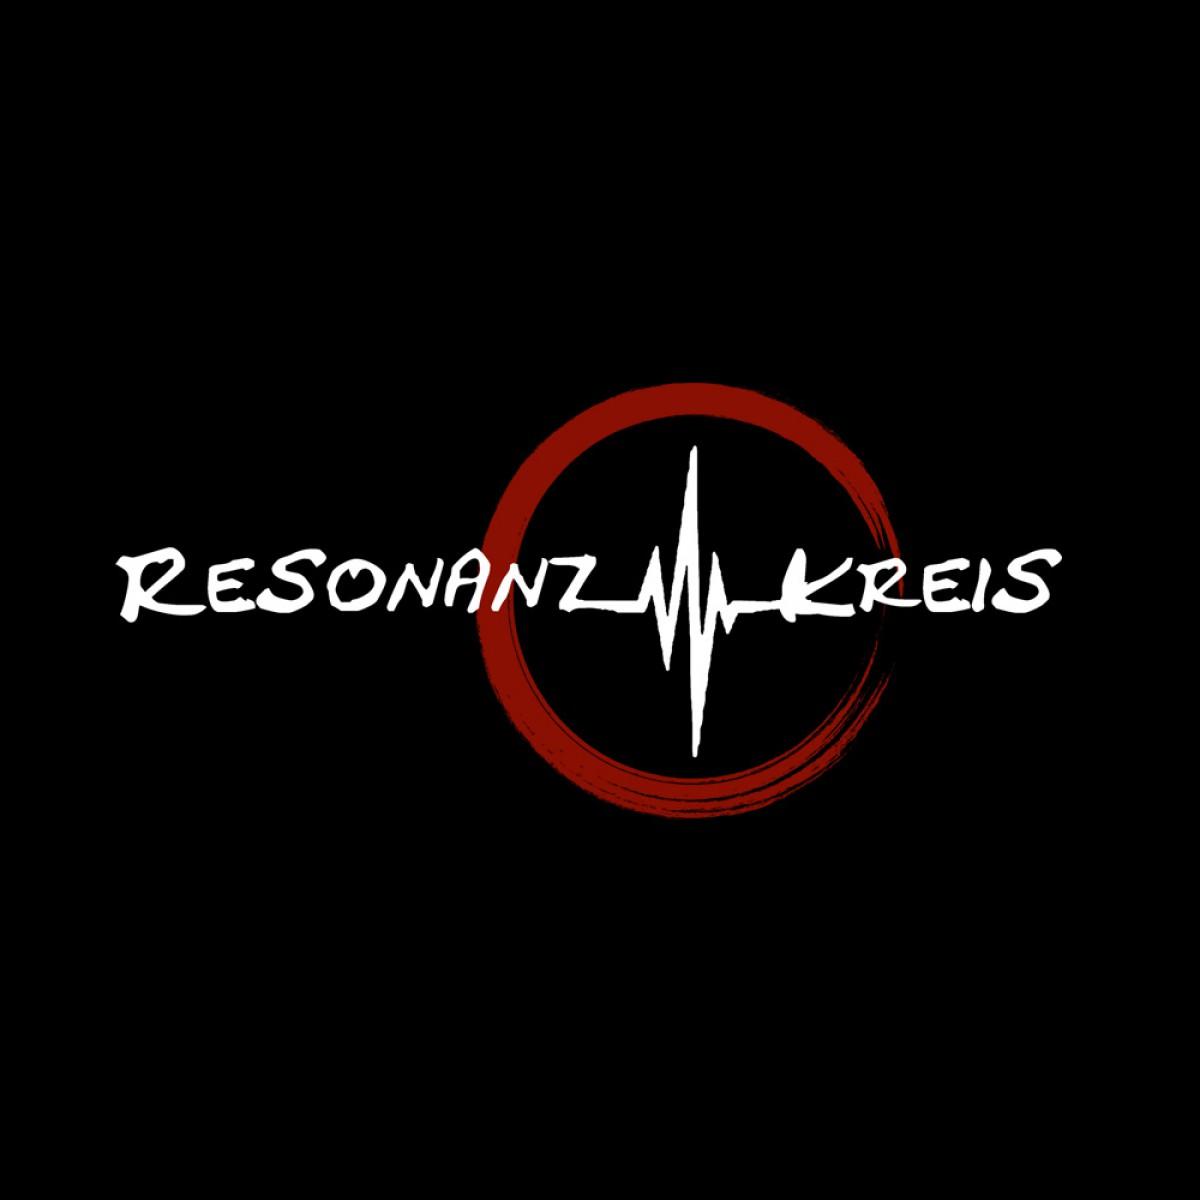 Resonanz Kreis